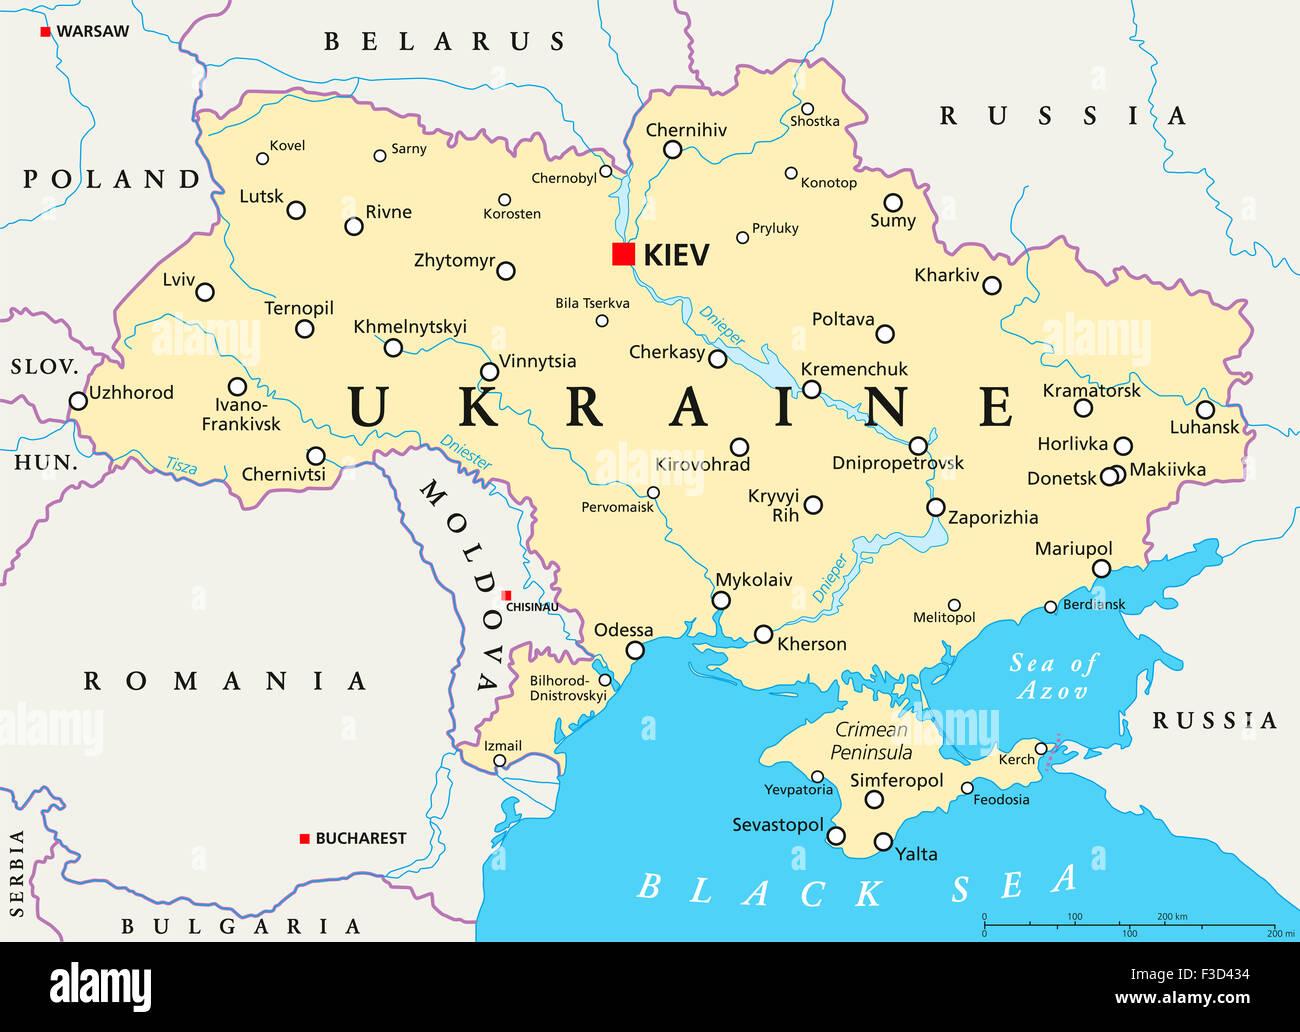 Cartina Geografica Ucraina Russia